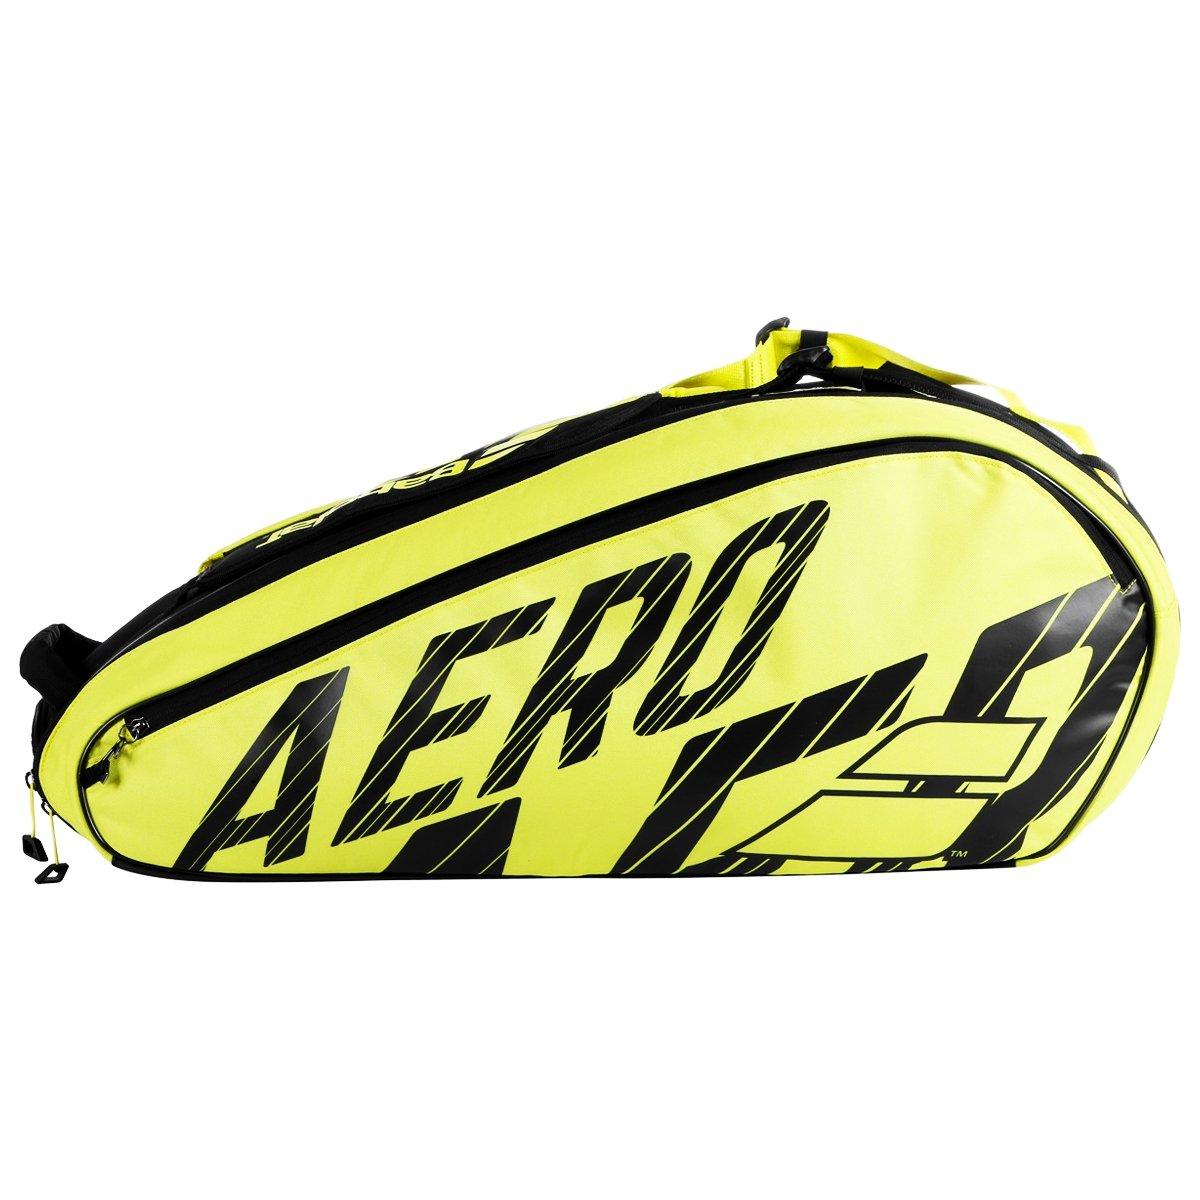 Raqueteira Babolat Pure Aero 6R Térmica Preto e Amarela - 2021  - PROTENISTA